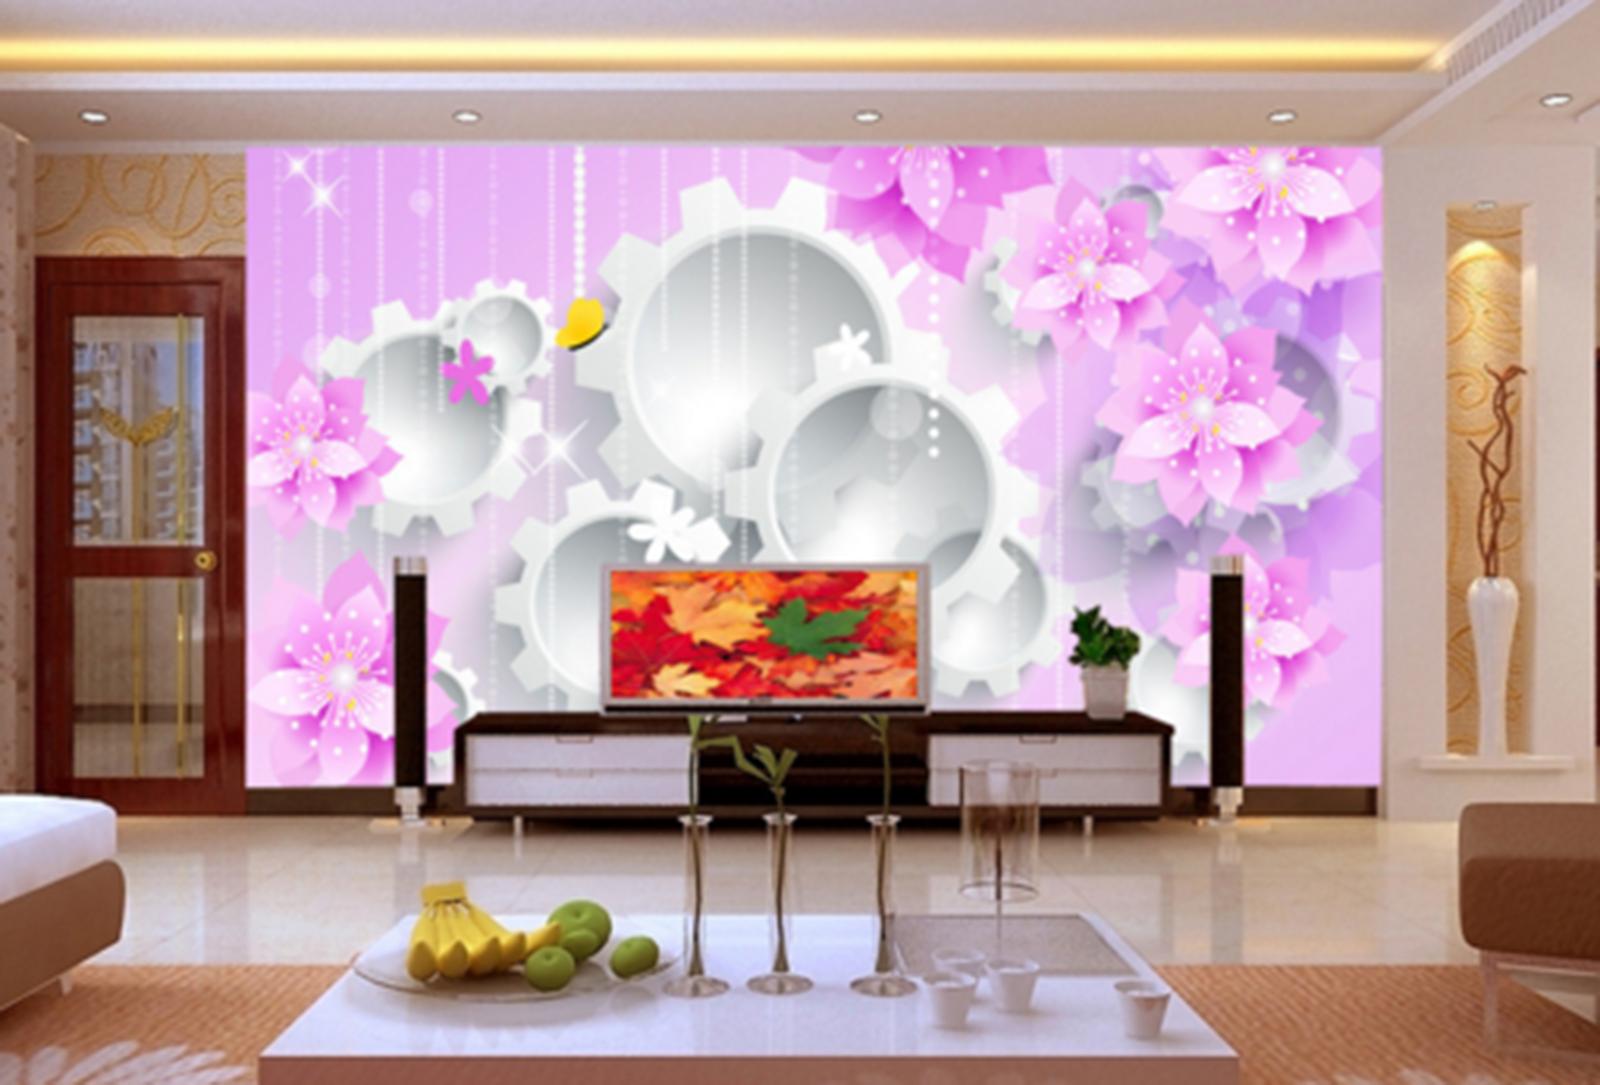 3D Weiß Gear 498 Wallpaper Murals Wall Print Wallpaper Mural AJ WALL AU Kyra